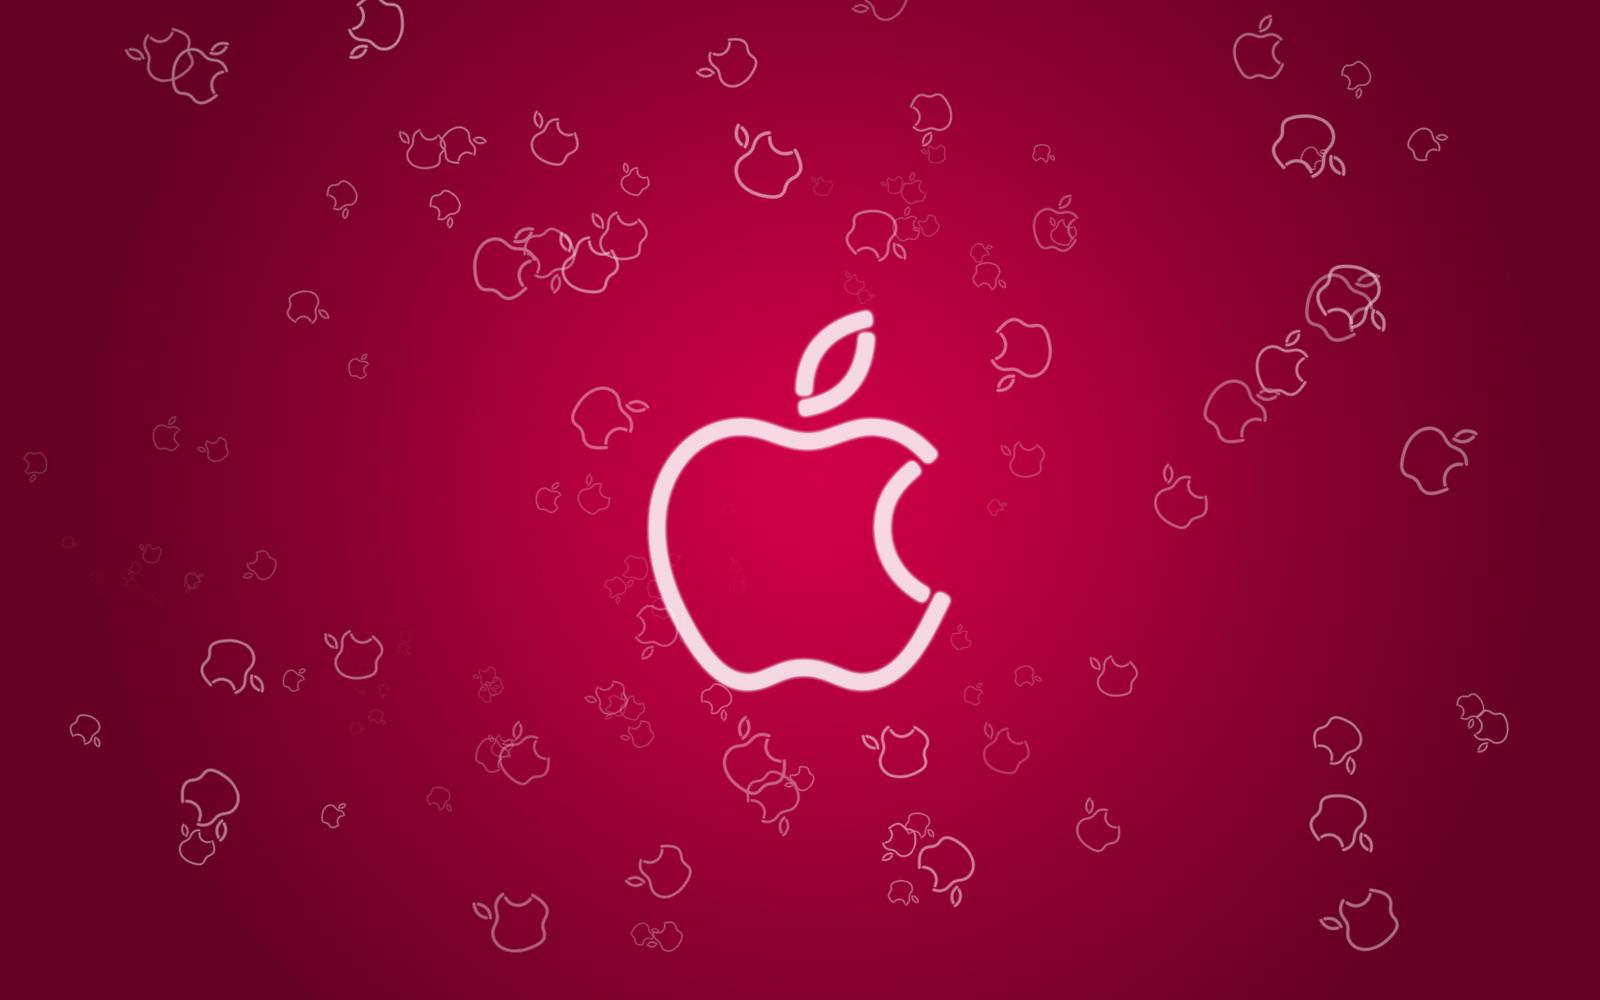 http://2.bp.blogspot.com/-cff3fwCT7j4/UDGTBBa7Q1I/AAAAAAAAD_s/k5t_4bONGtI/s1600/Apple_flakes_hd_wallpaper.png